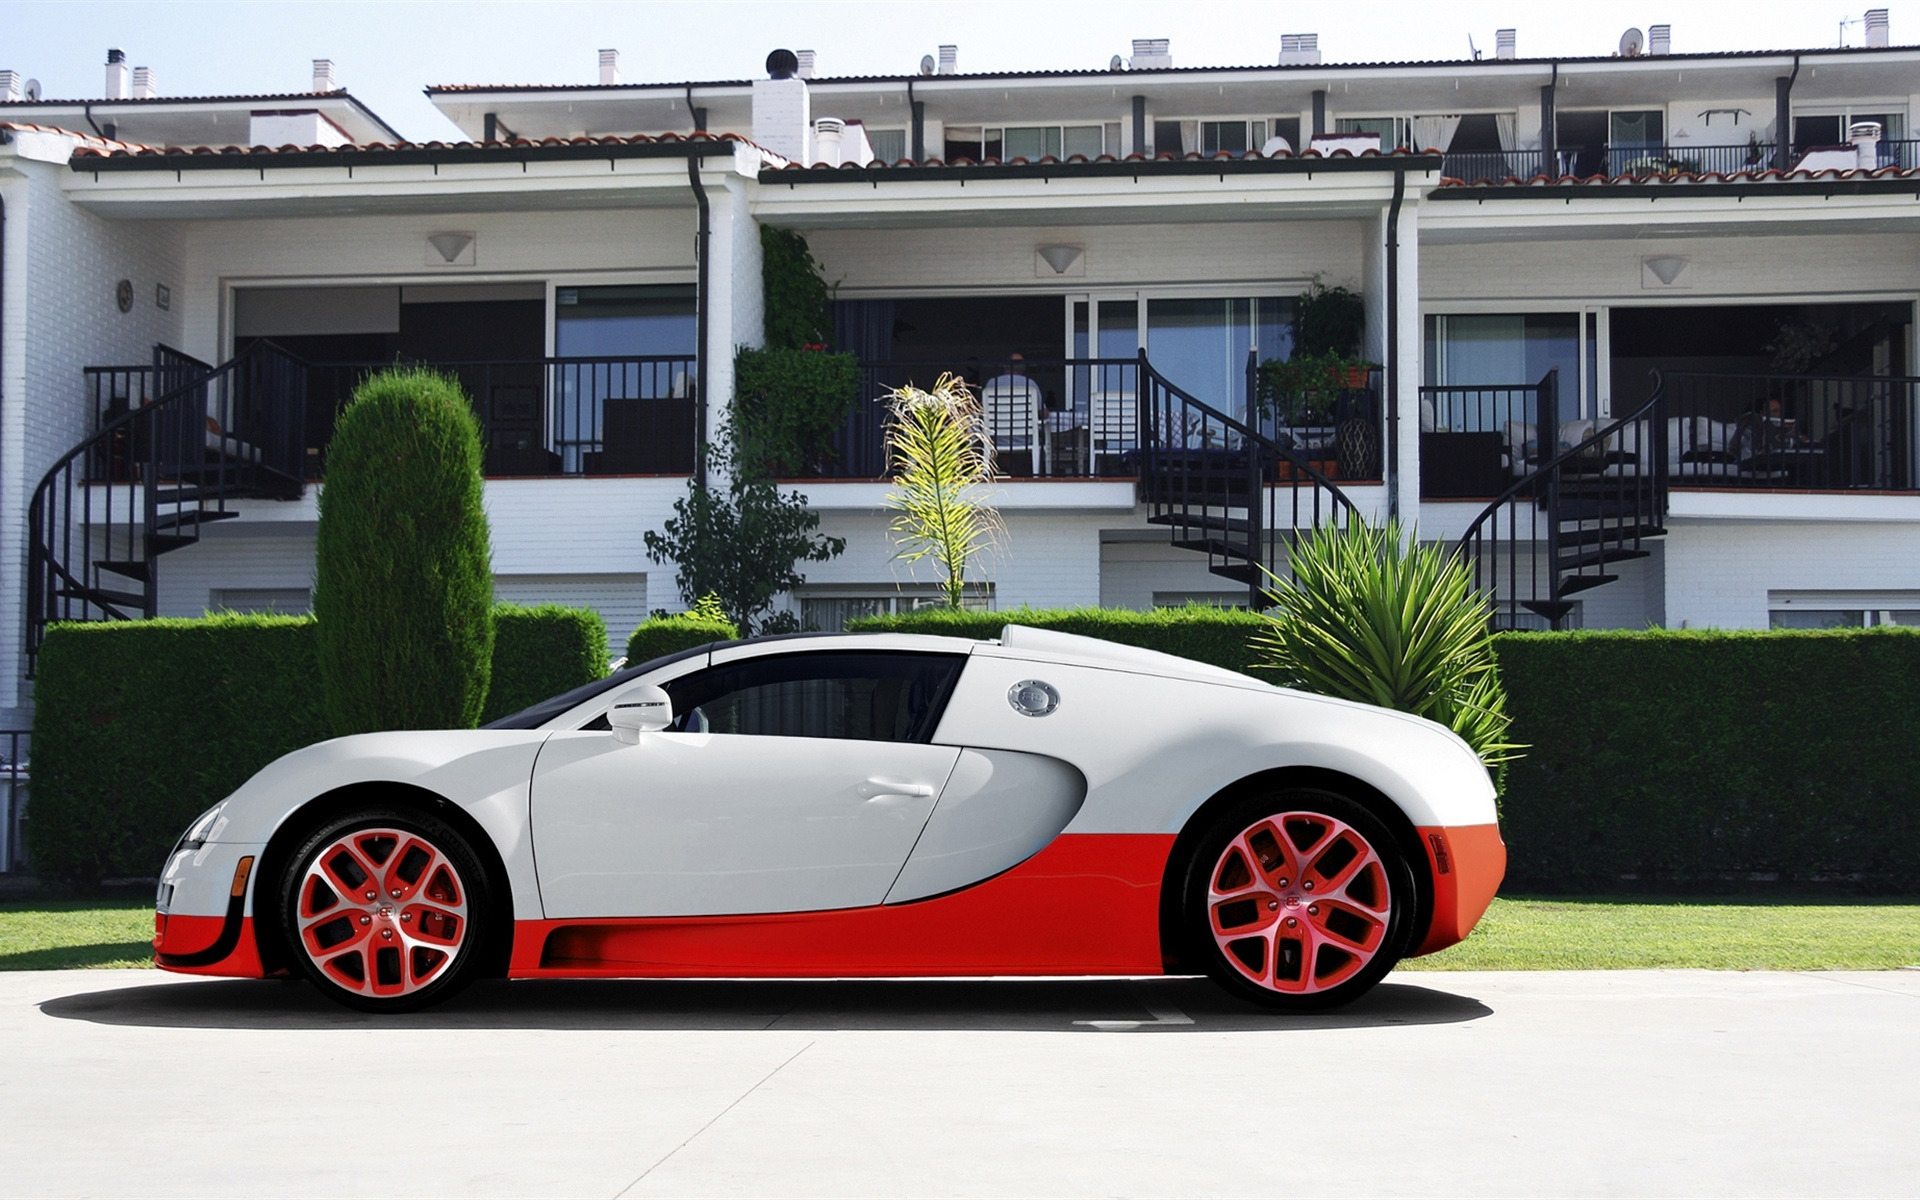 bugatti veyron supercar cor branca e vermelha pap is de. Black Bedroom Furniture Sets. Home Design Ideas